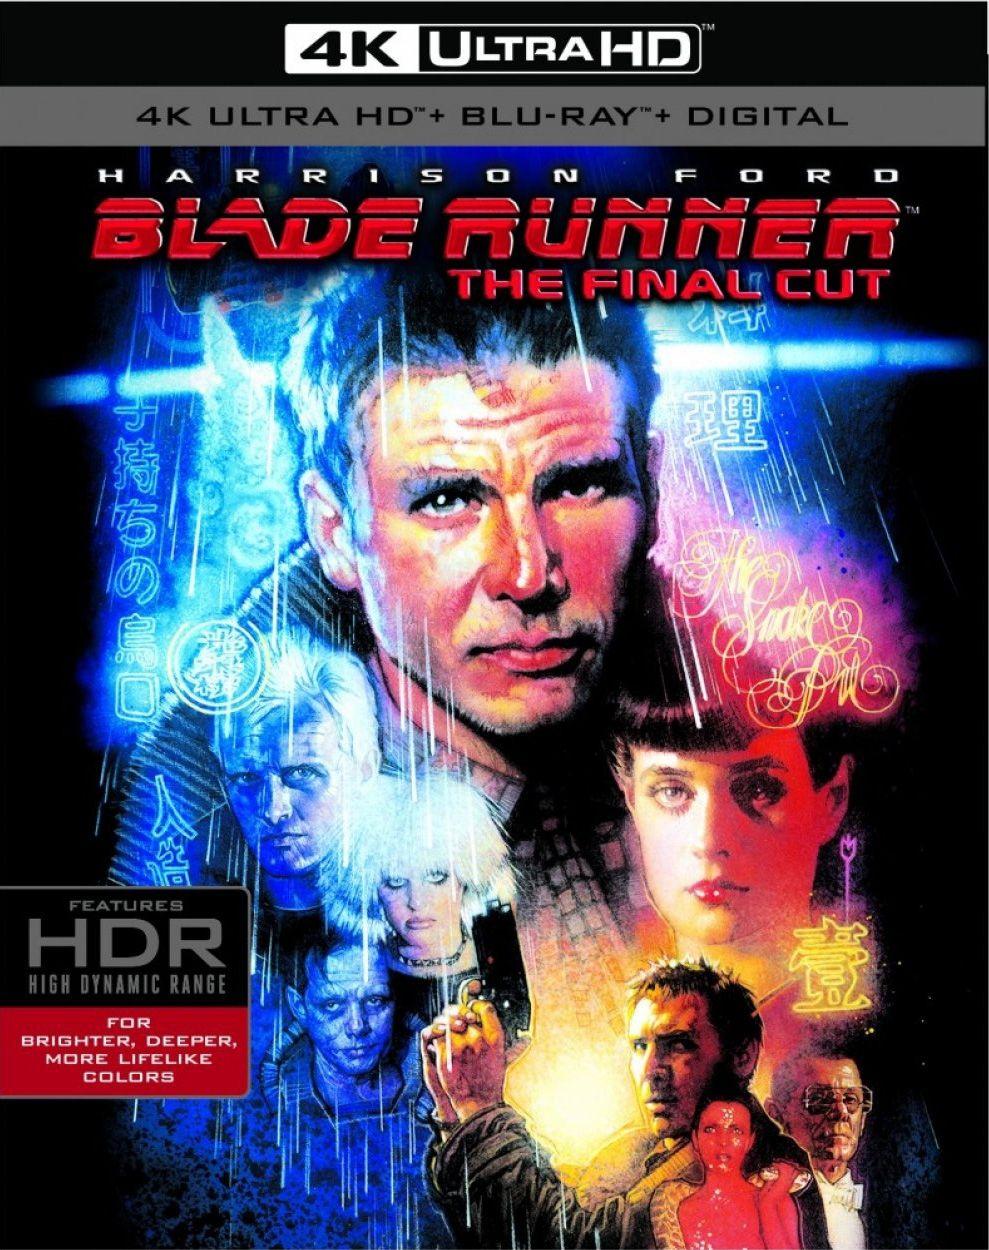 Blade Runner: The Final Cut (2 Discs) (UHD BLURAY + BLURAY)